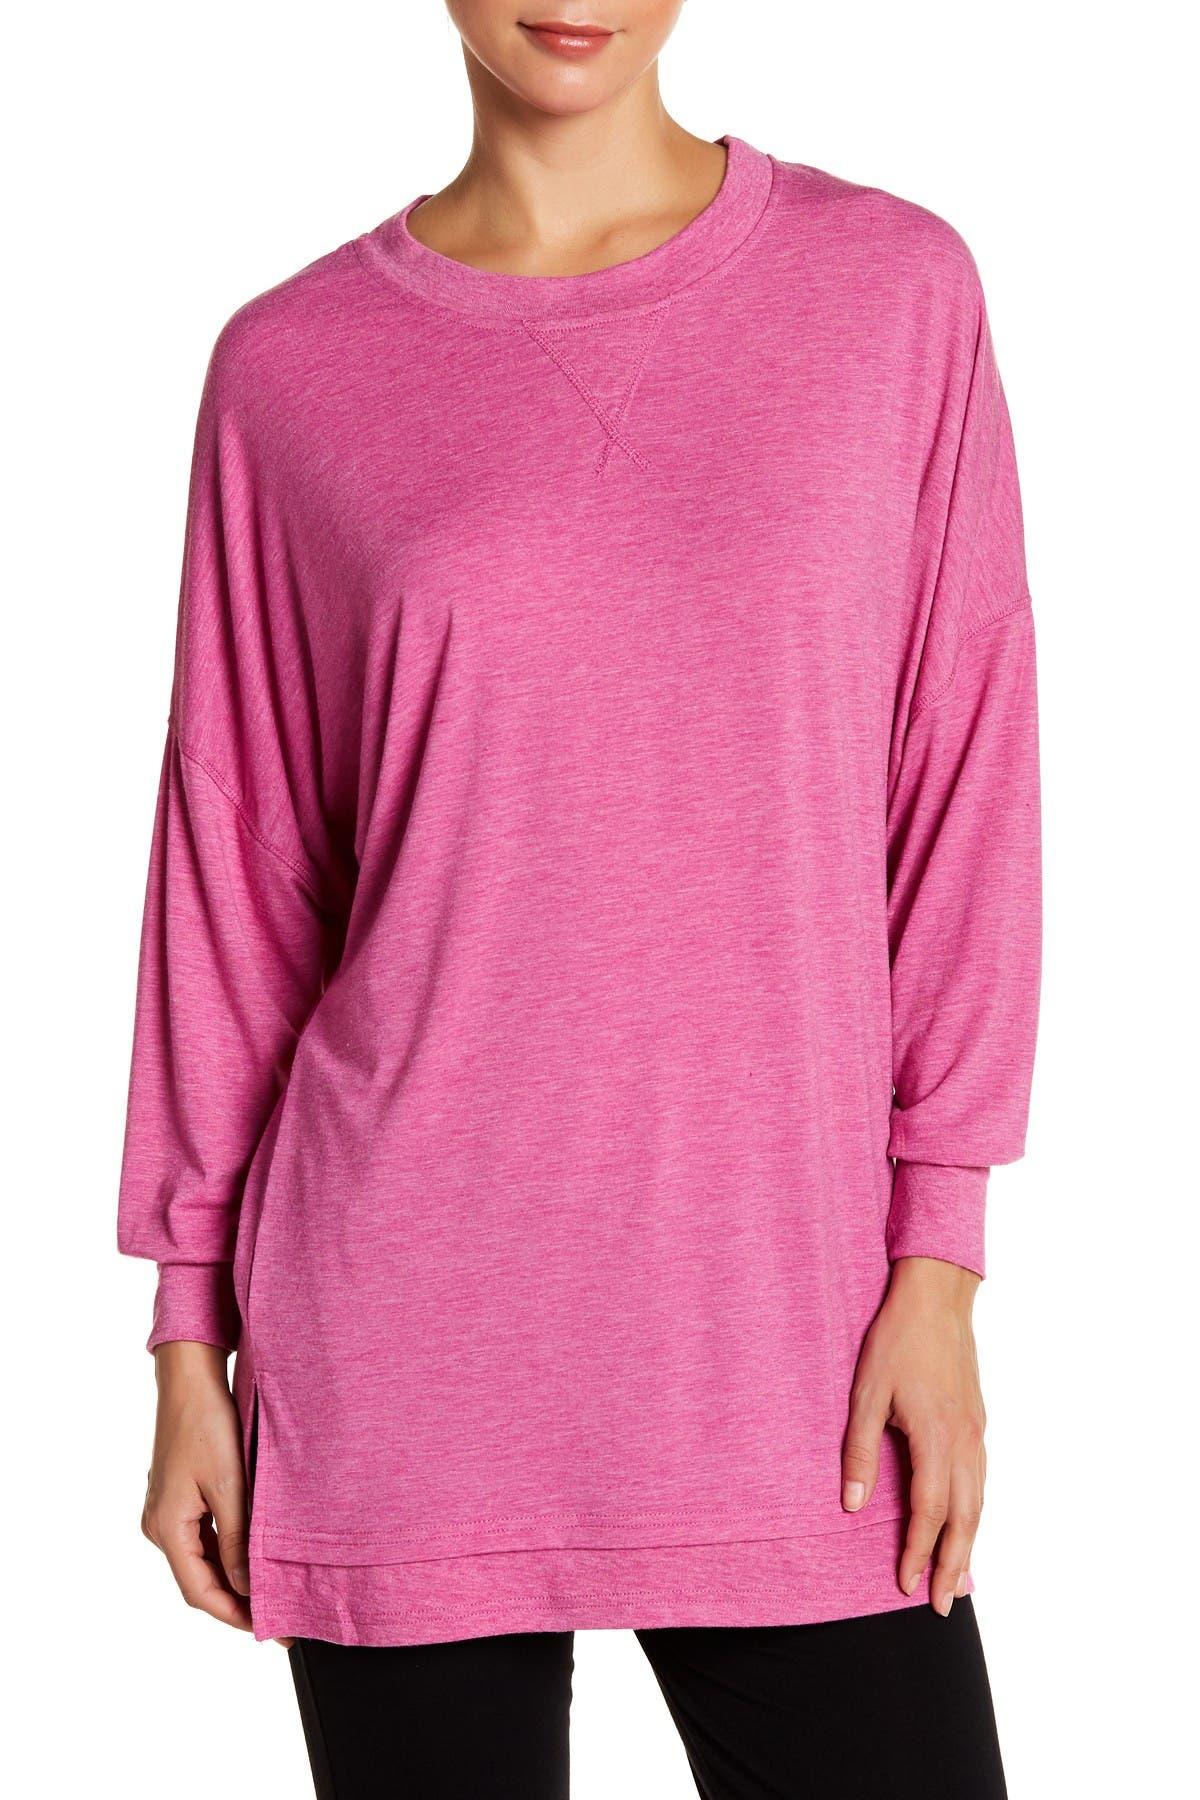 Image of Honeydew Intimates Long Sleeve Nightshirt